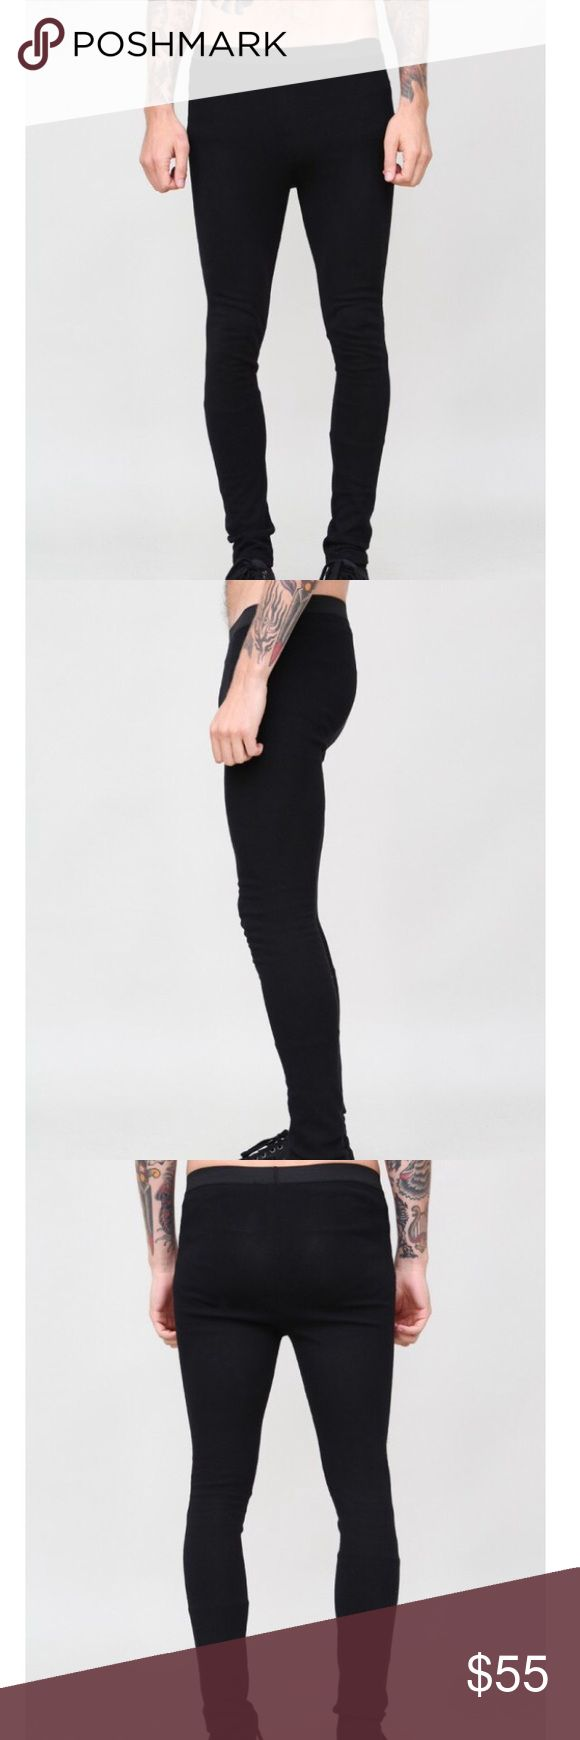 NWT Oak NYC Black Leggings Brand new never work pair of Lille Oak NYC leggings. Great for layering and super comfy. OAK Pants Sweatpants & Joggers